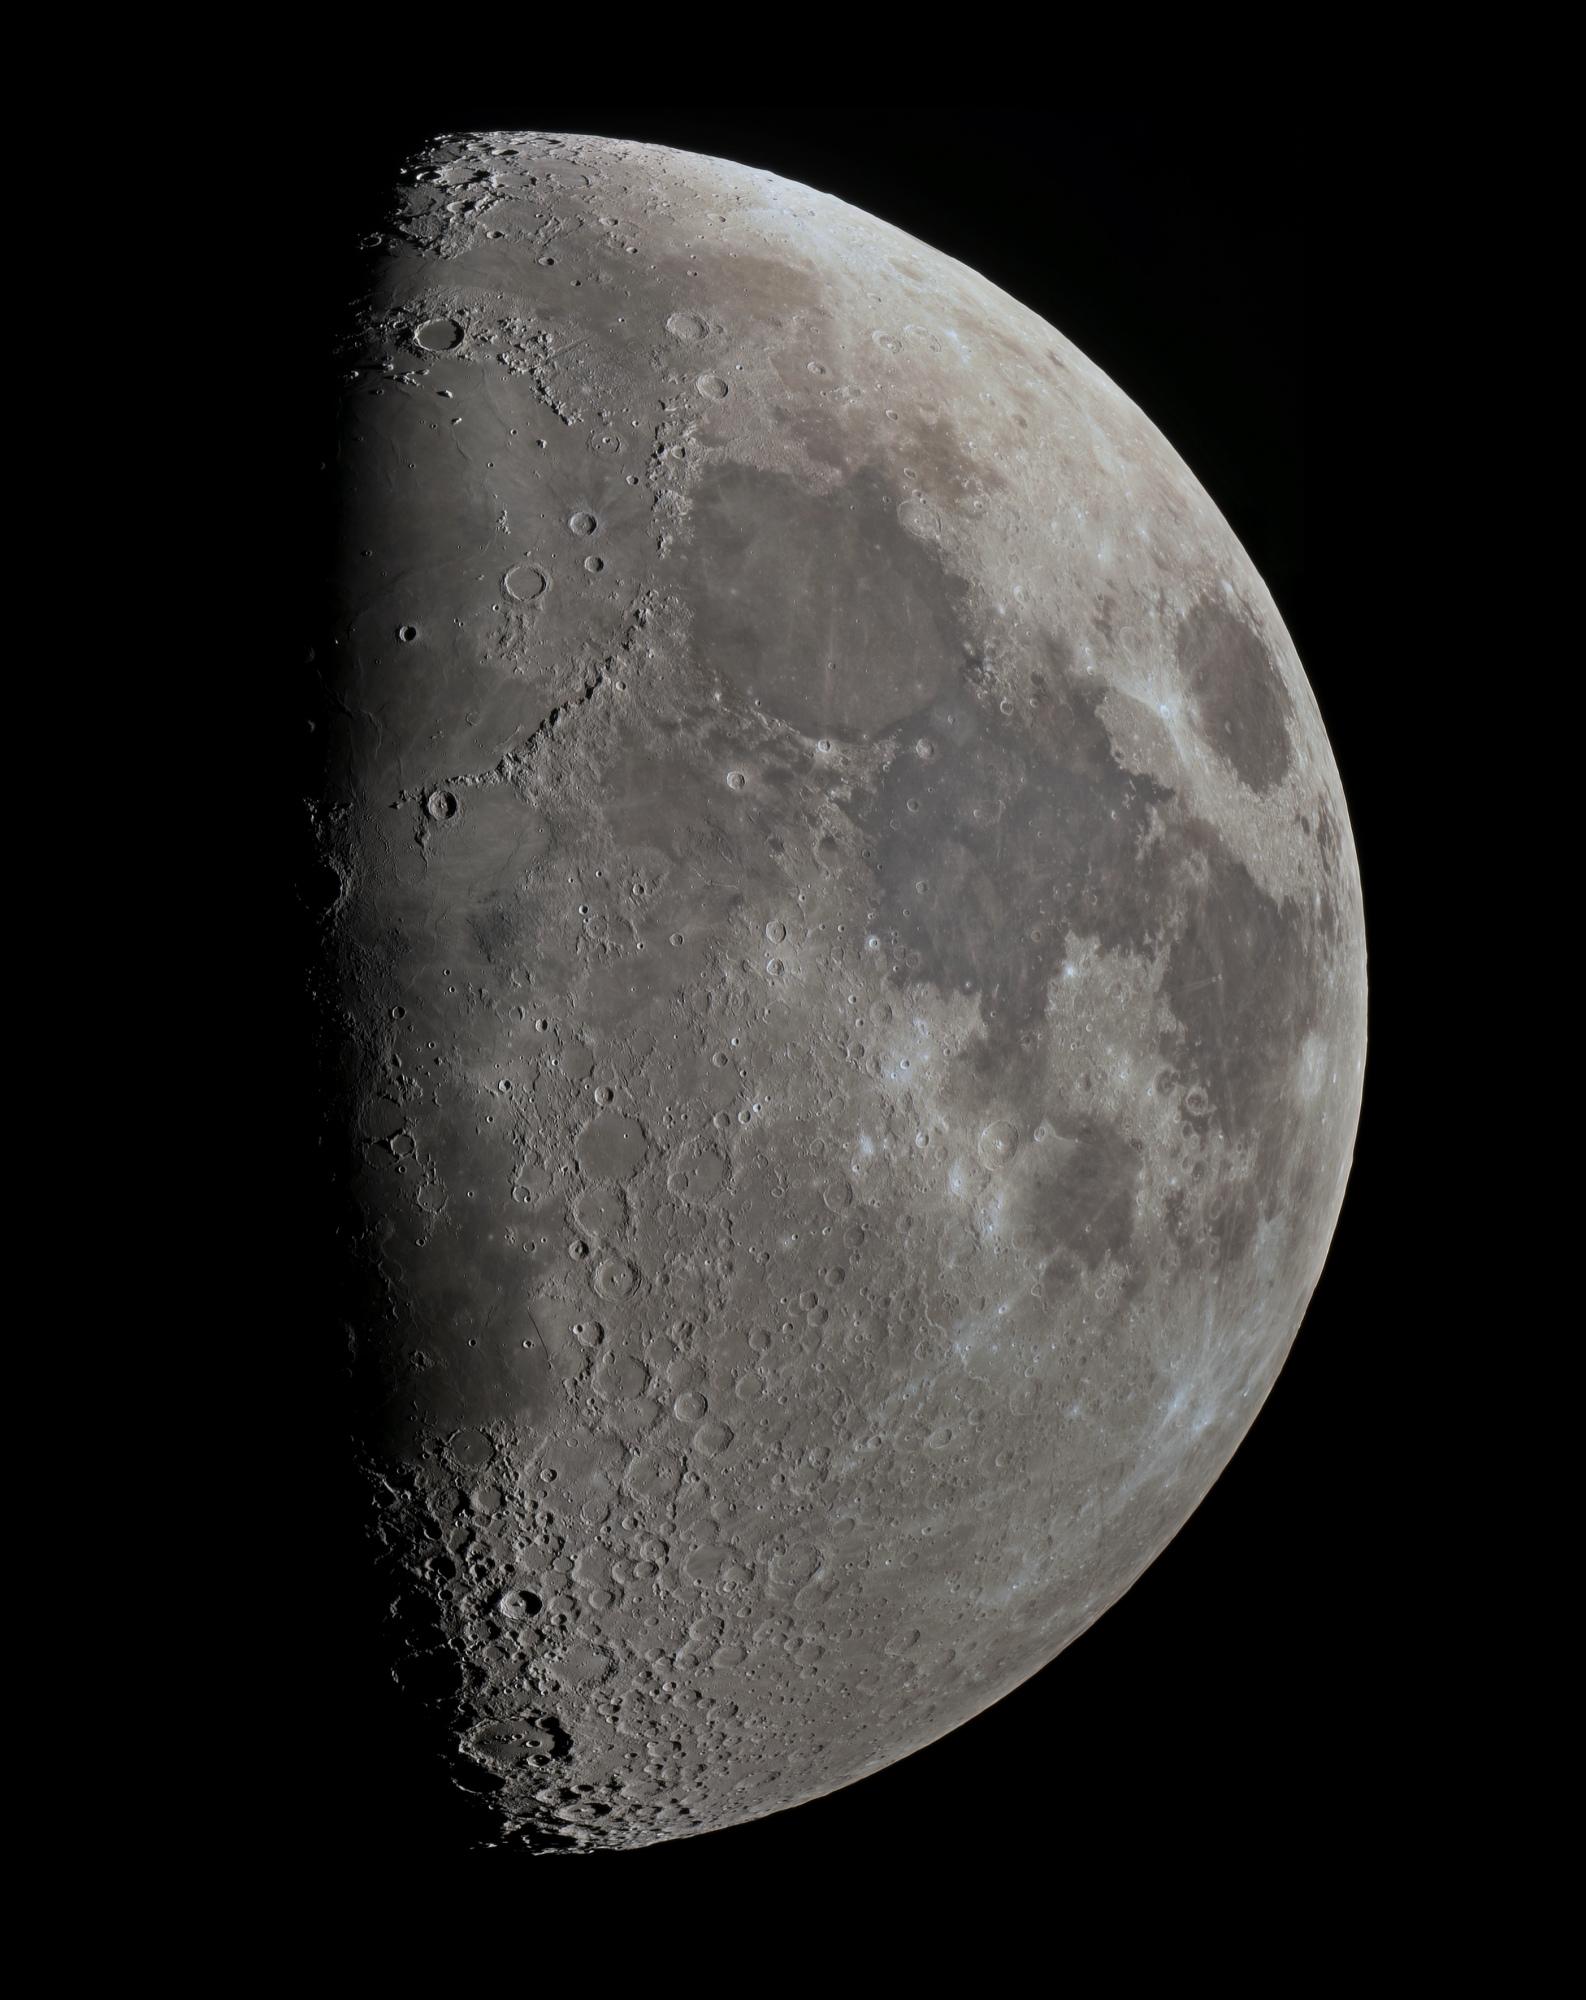 lune_normal.thumb.jpg.ba4c8f04673258a88c1032a19b3b0469.jpg